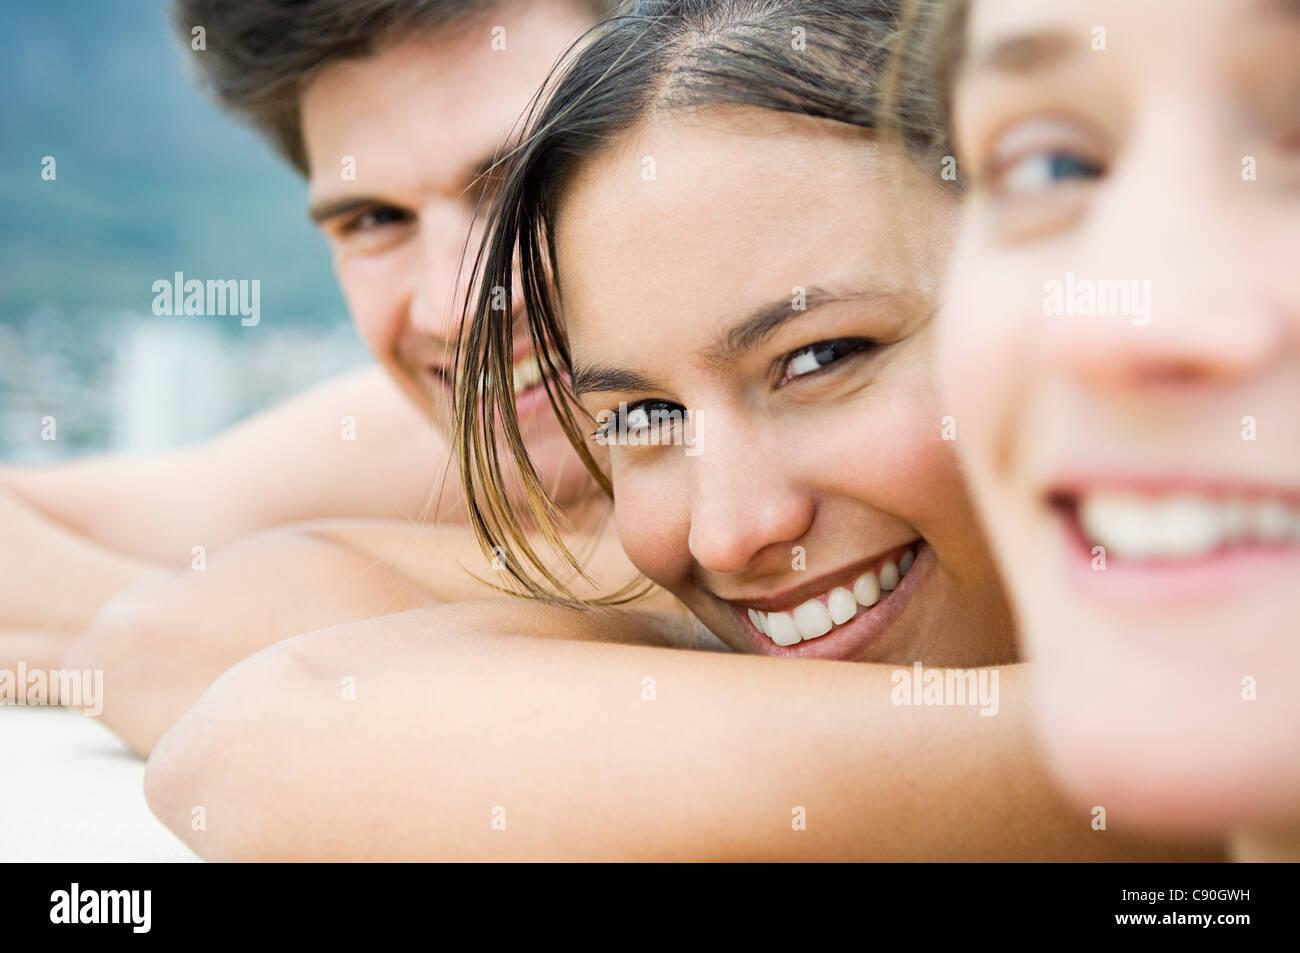 Three people, close up portrait - Stock Image